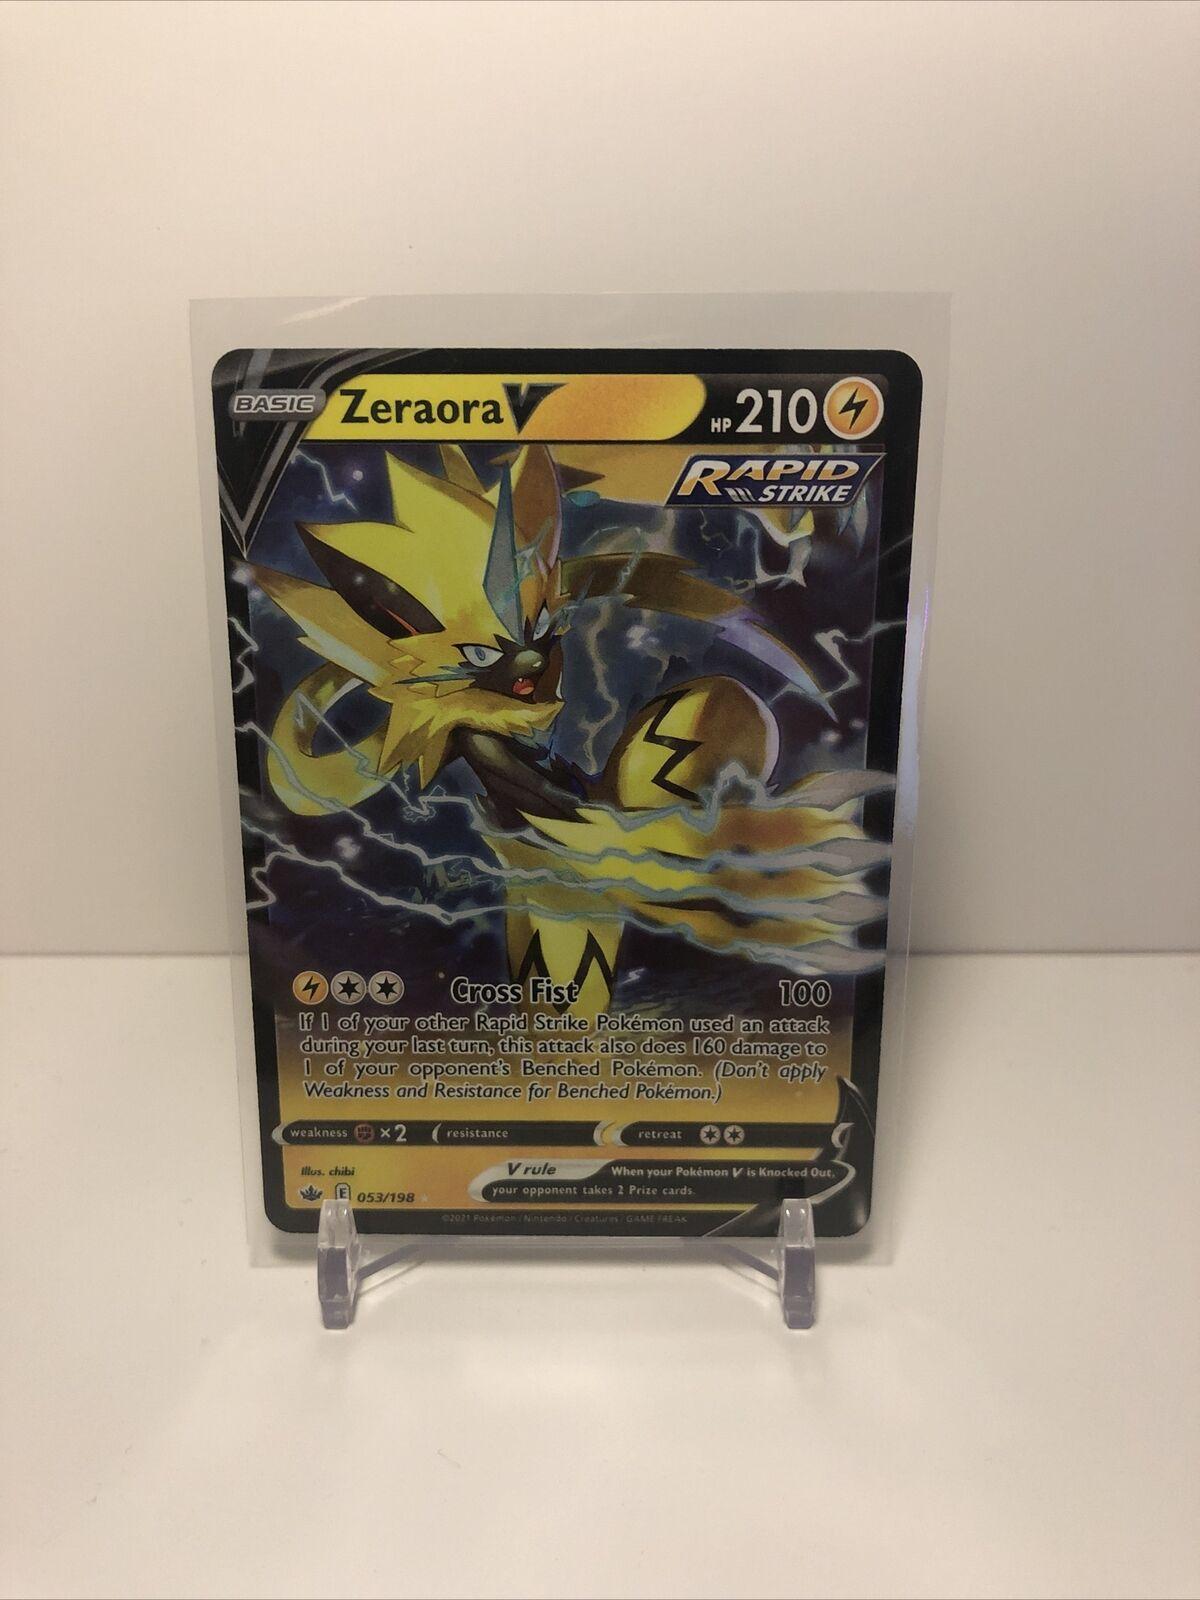 Zeraora V Pokémon Card (Chilling Reign 053/198) Ultra Rare